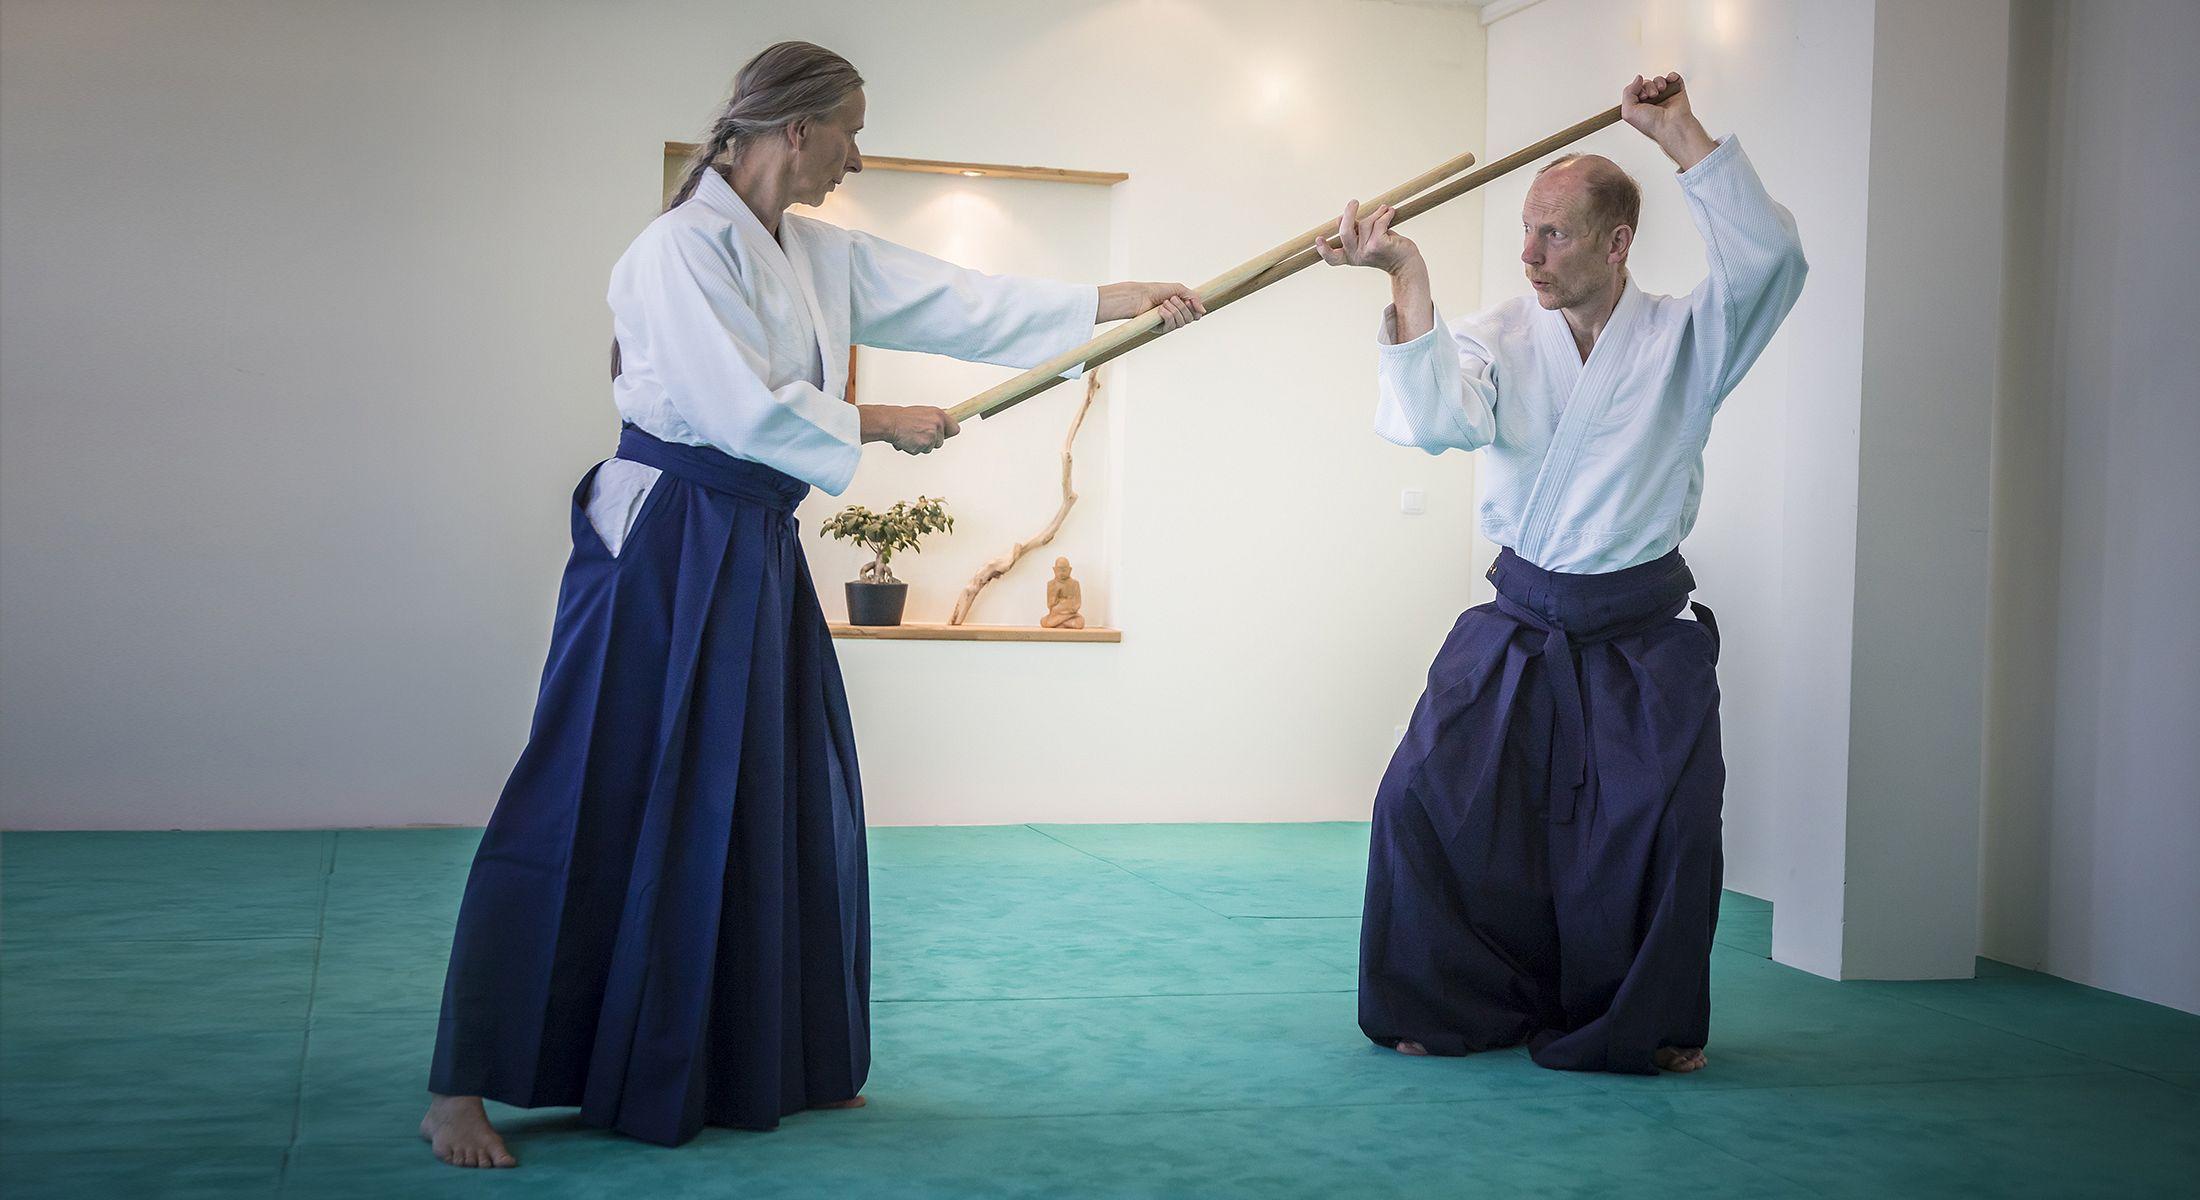 http://www.aikido-schule-bielefeld.de/wp-content/uploads/2018/12/slider08_1.jpg